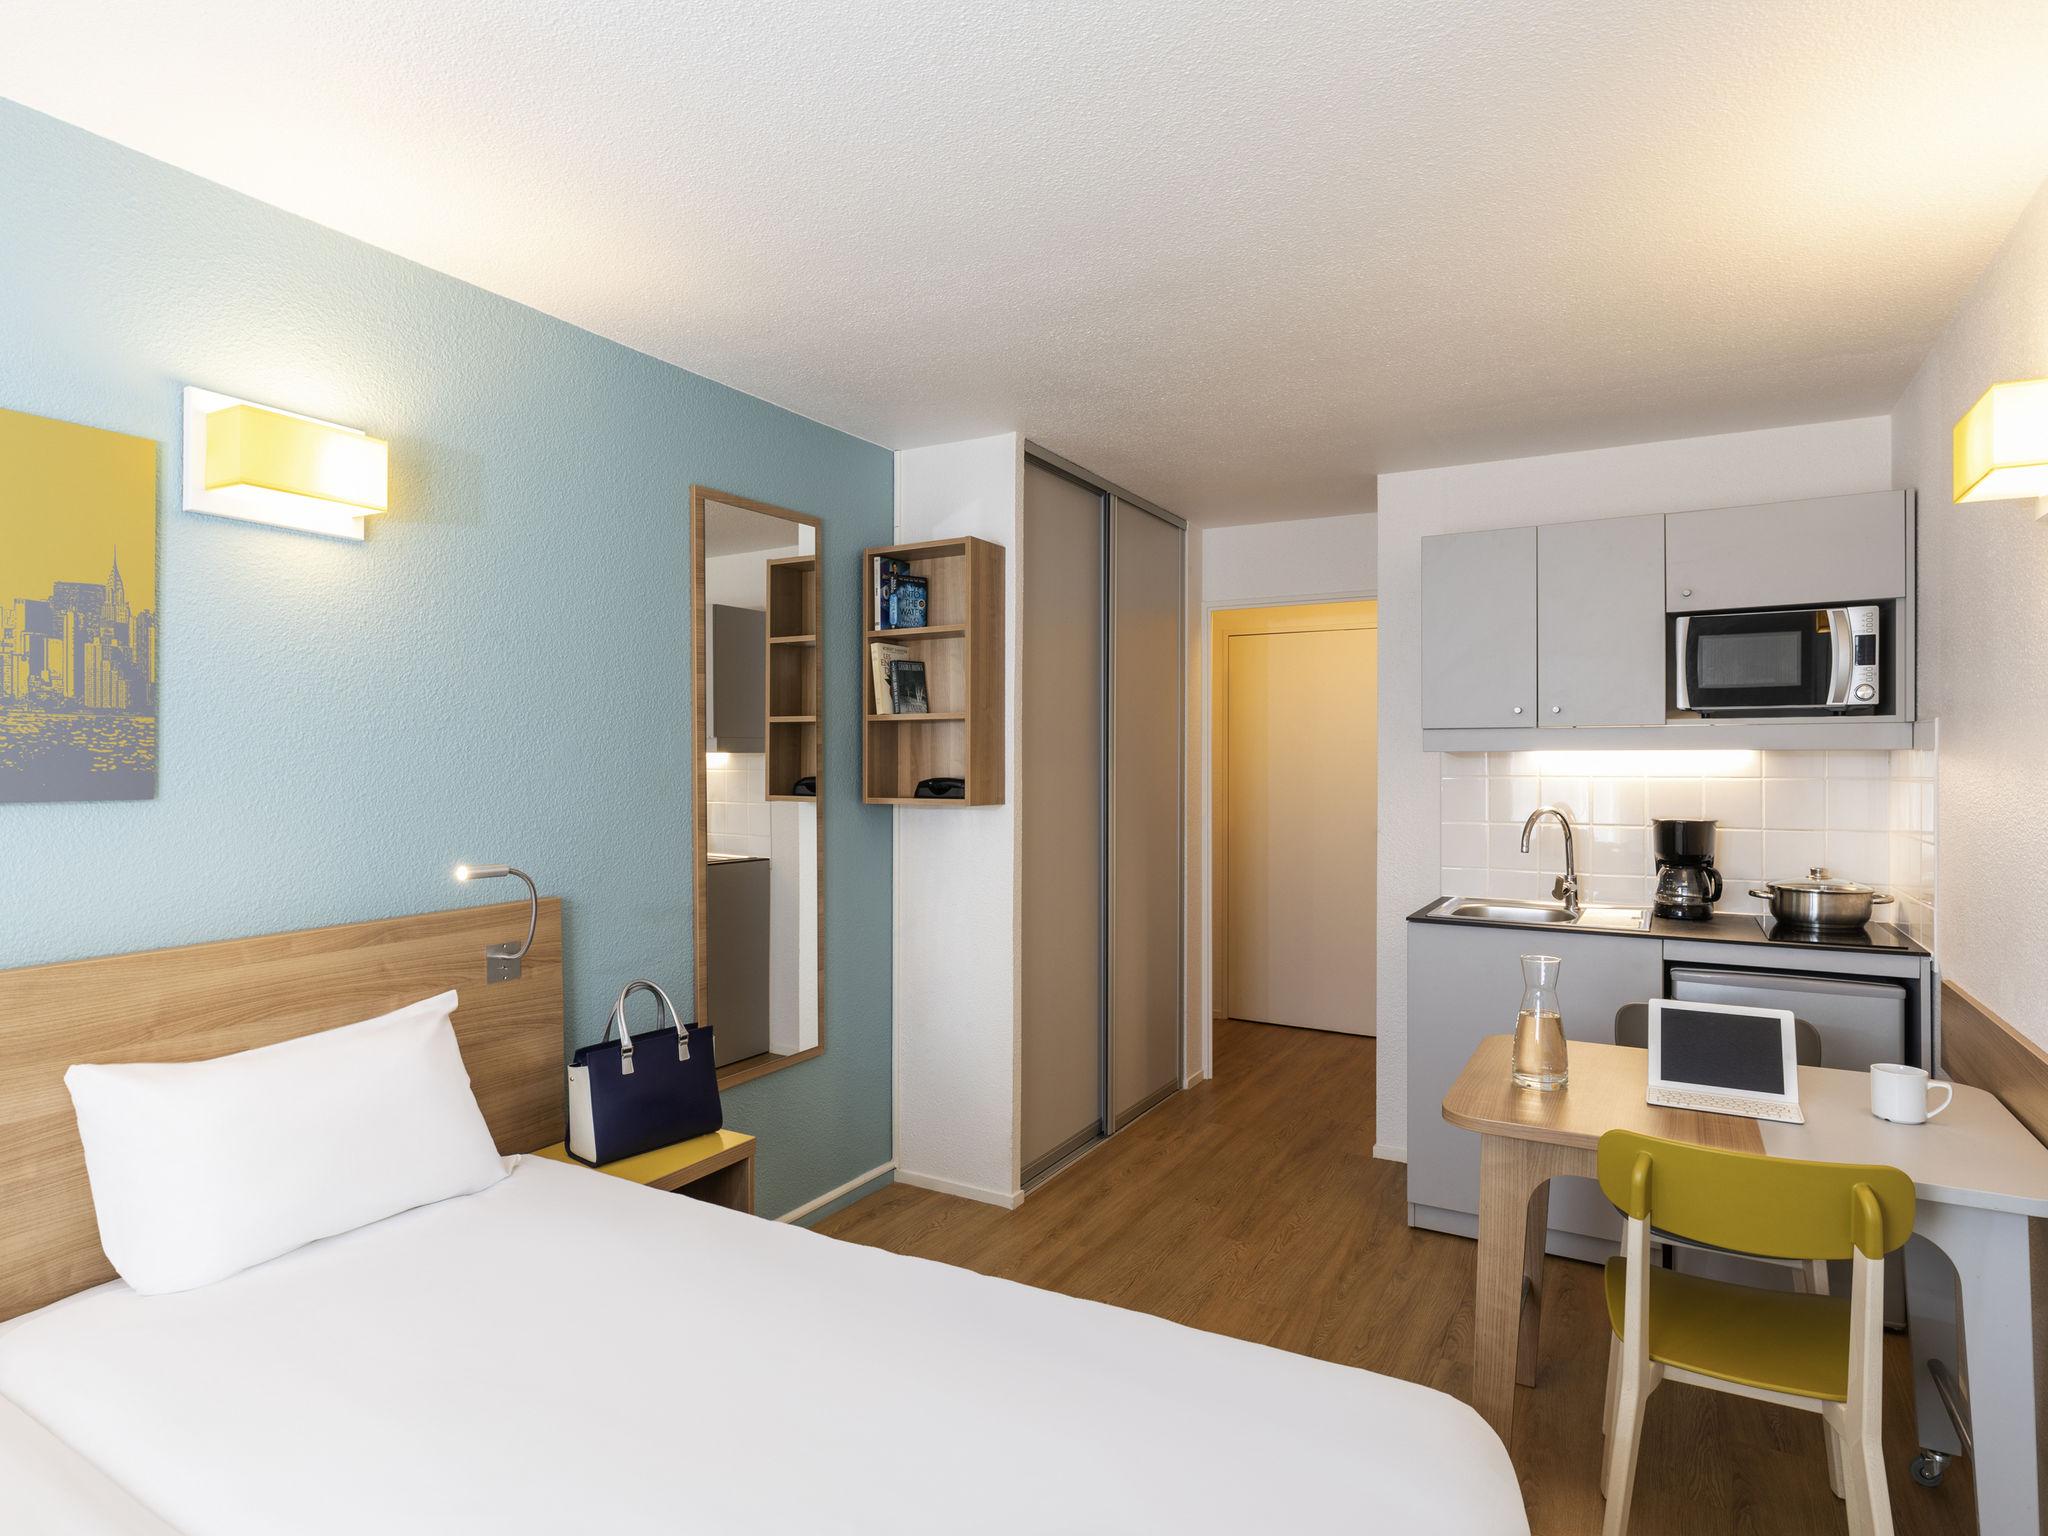 Hôtel - Aparthotel Adagio access La Défense Place Charras